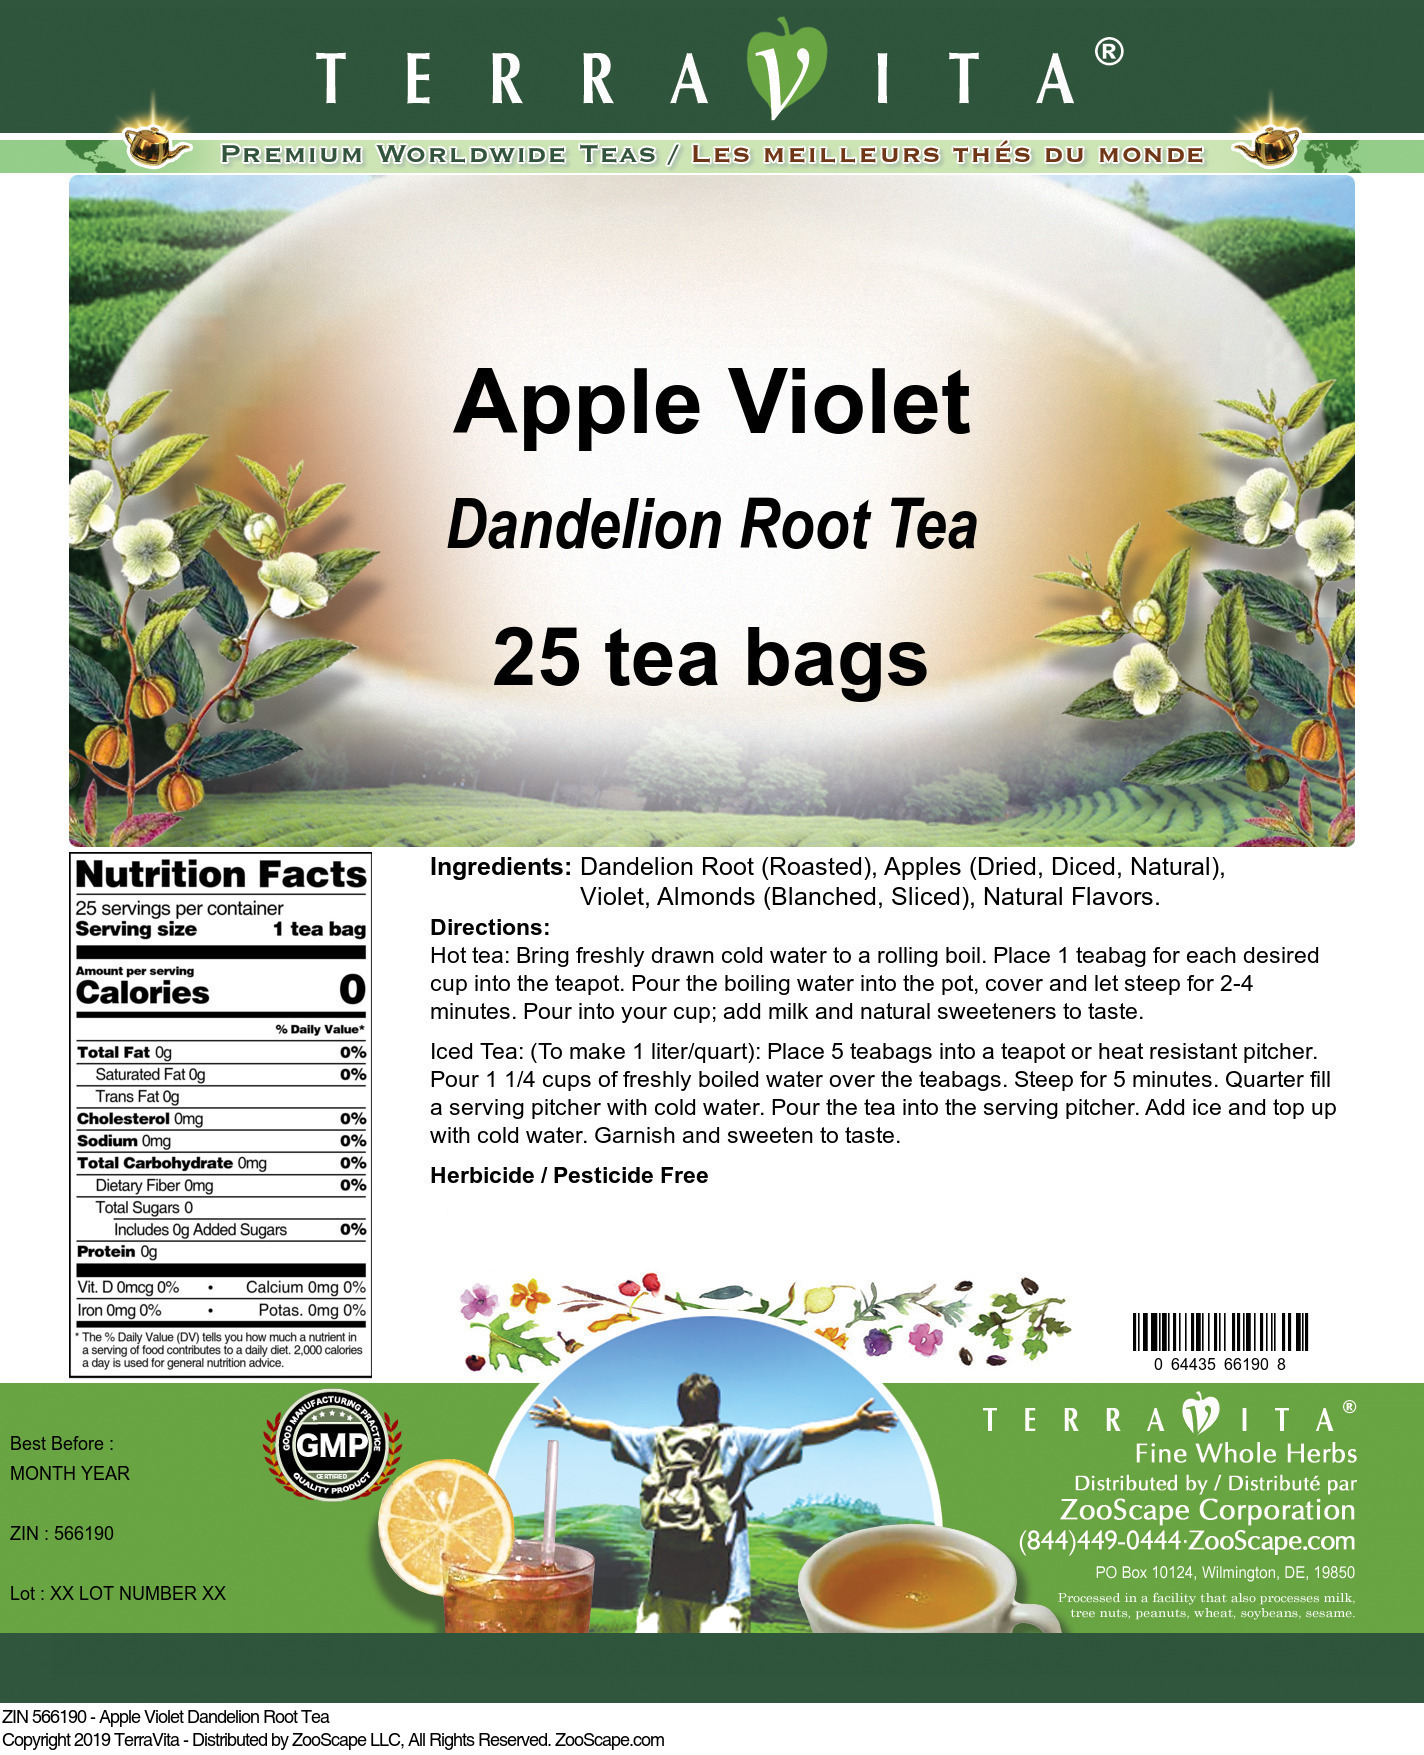 Apple Violet Dandelion Root Tea